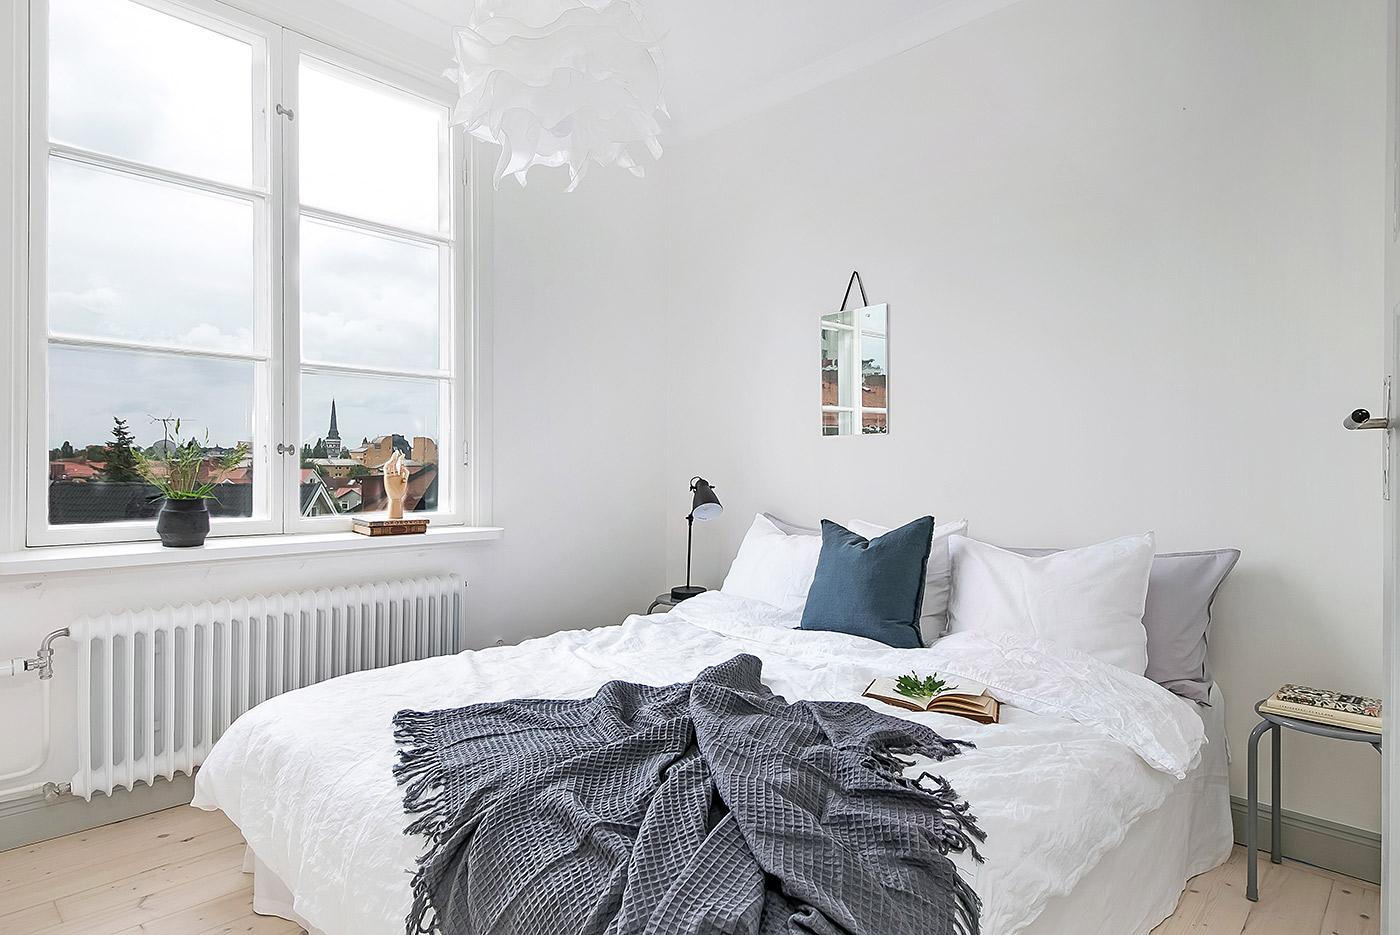 Krutkallarbacken-sovrum